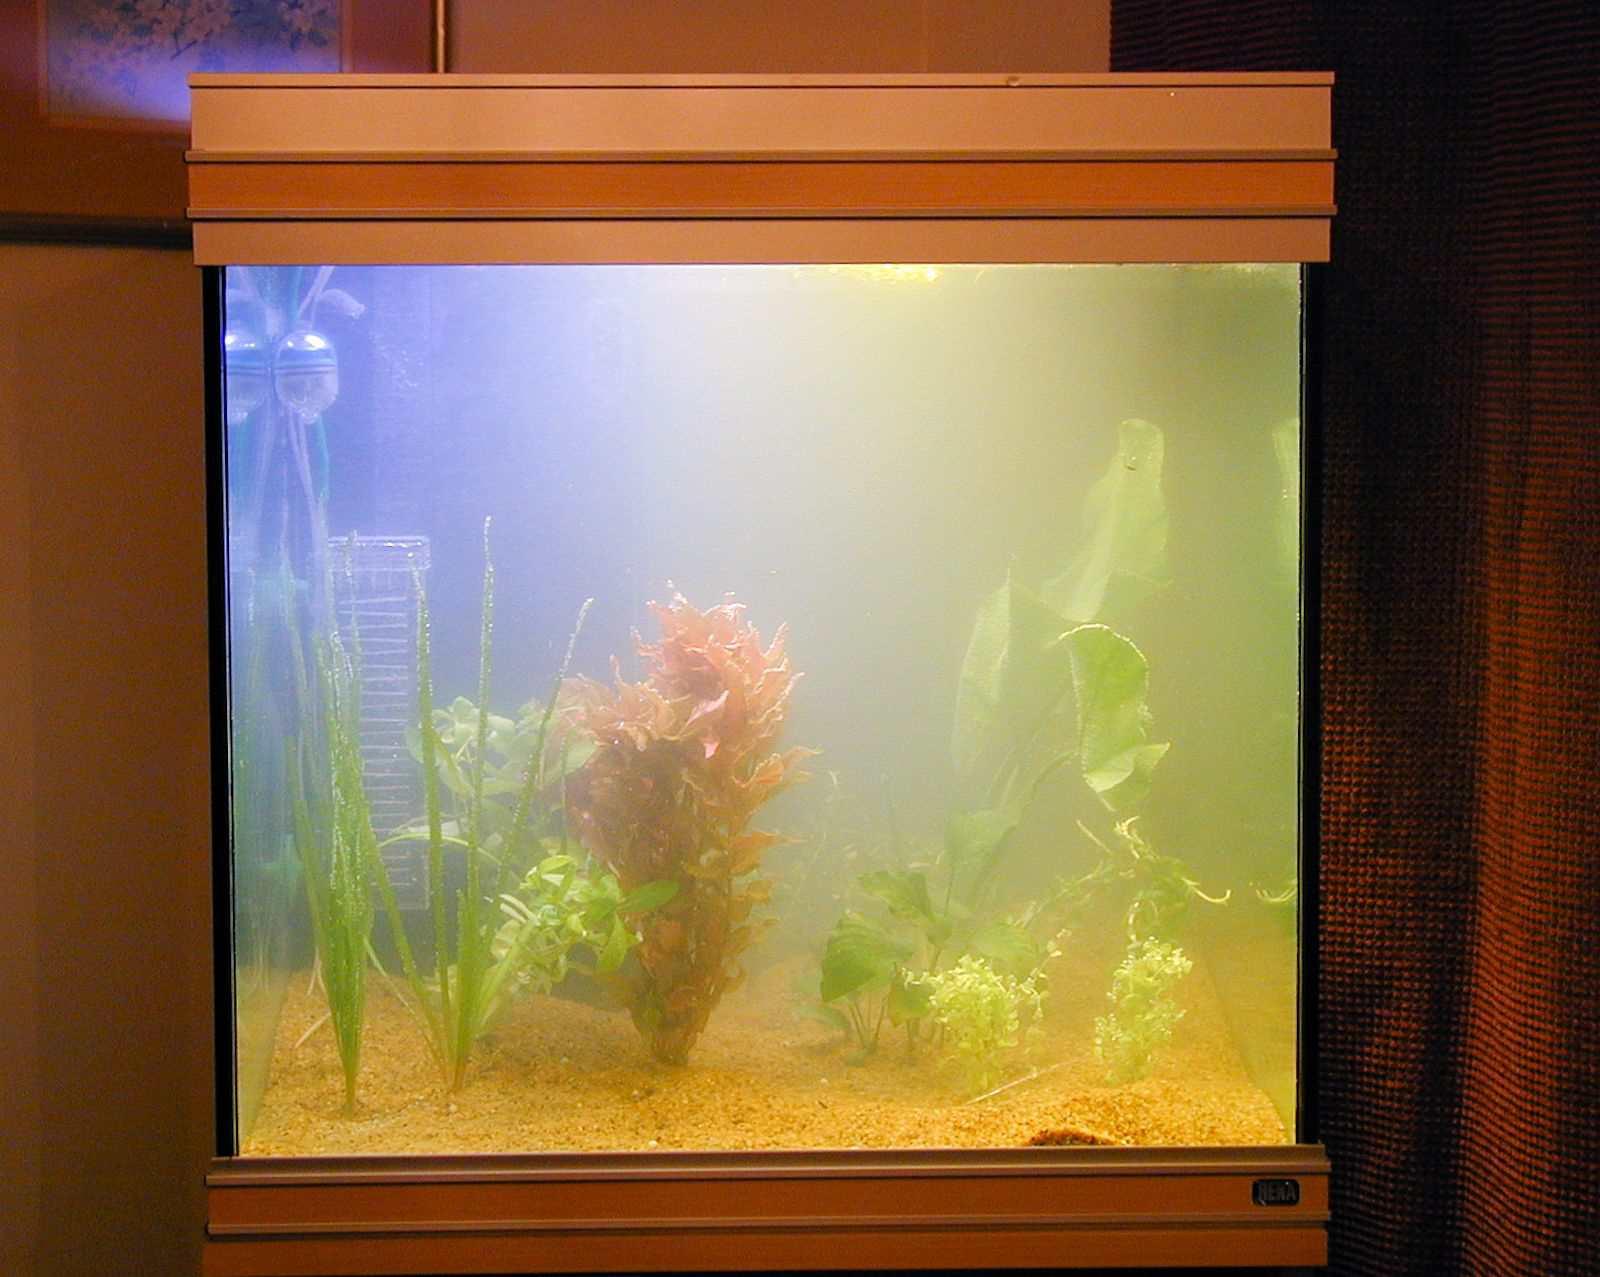 How to Balance Aquarium Water Basics